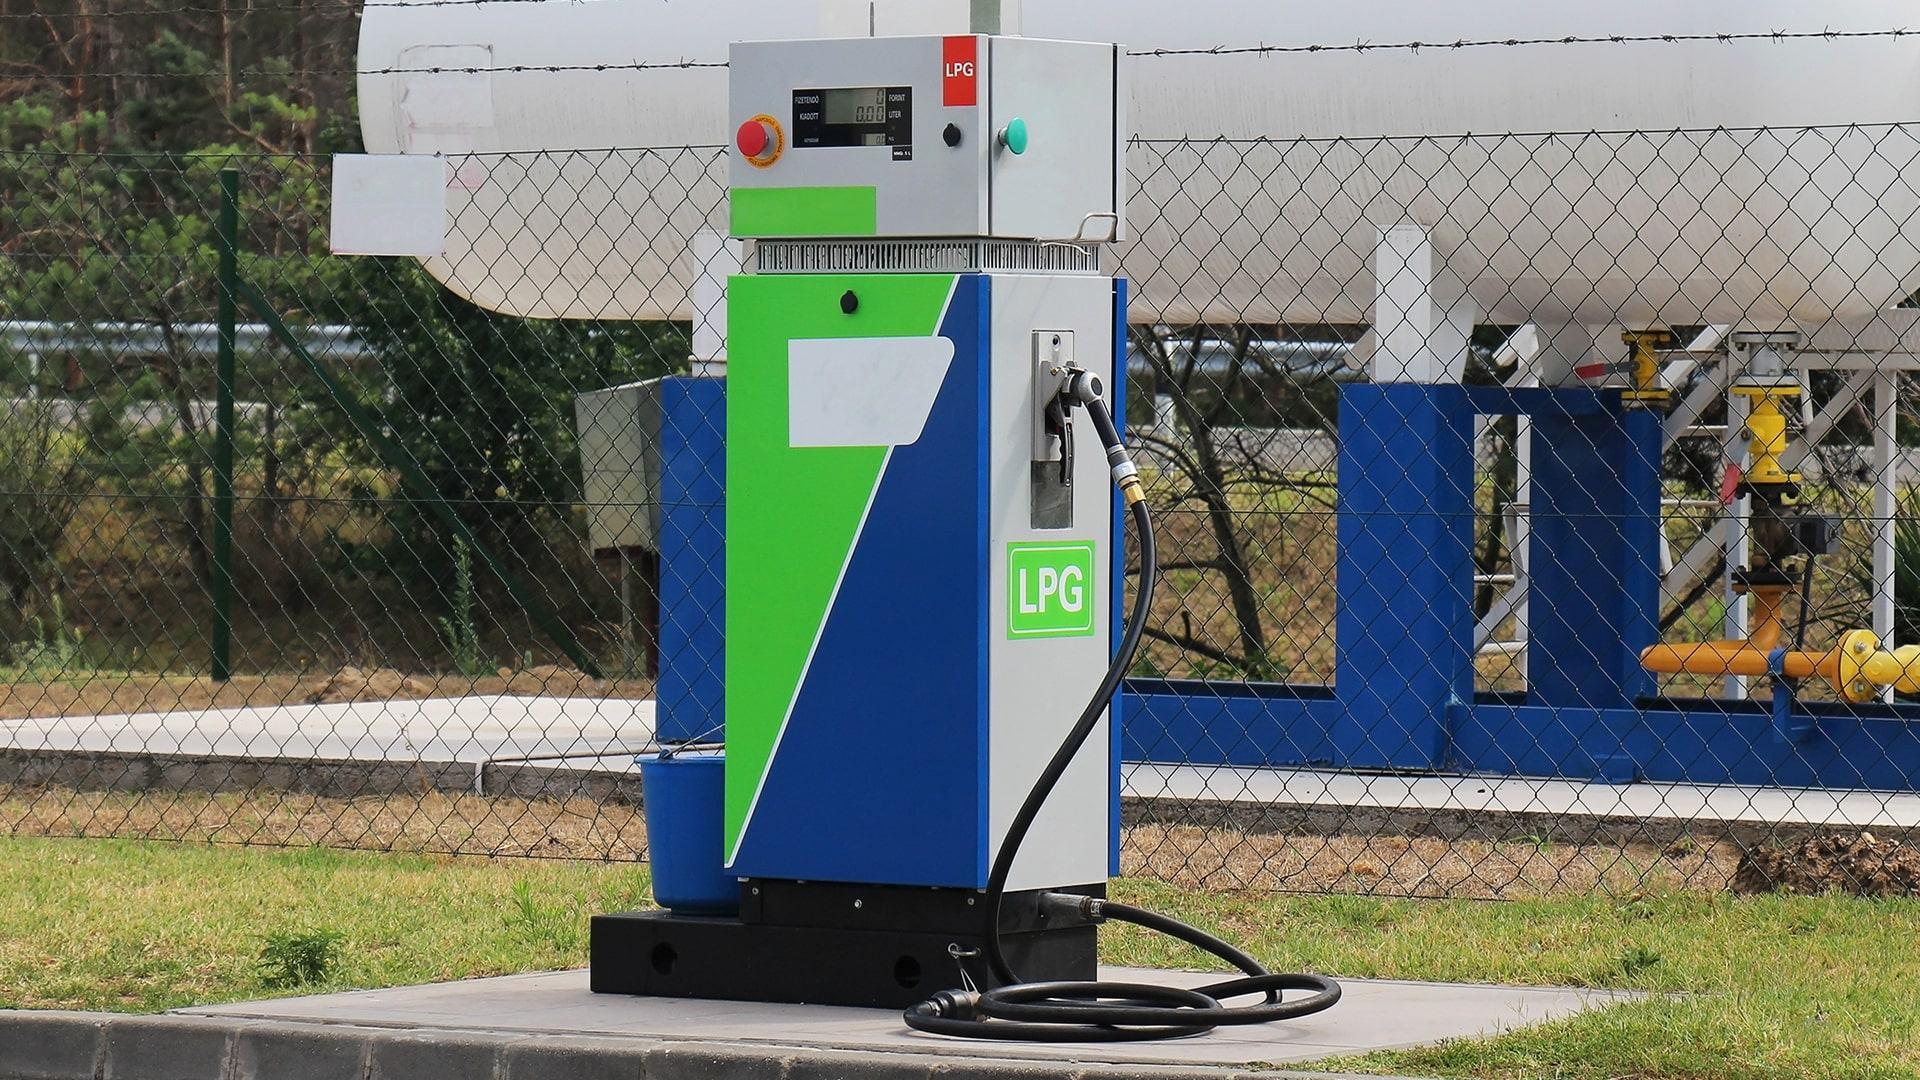 LPG CONVERSION KIT CNG CONVERSION KITS | ENERGIA ITALY | ECONOVA